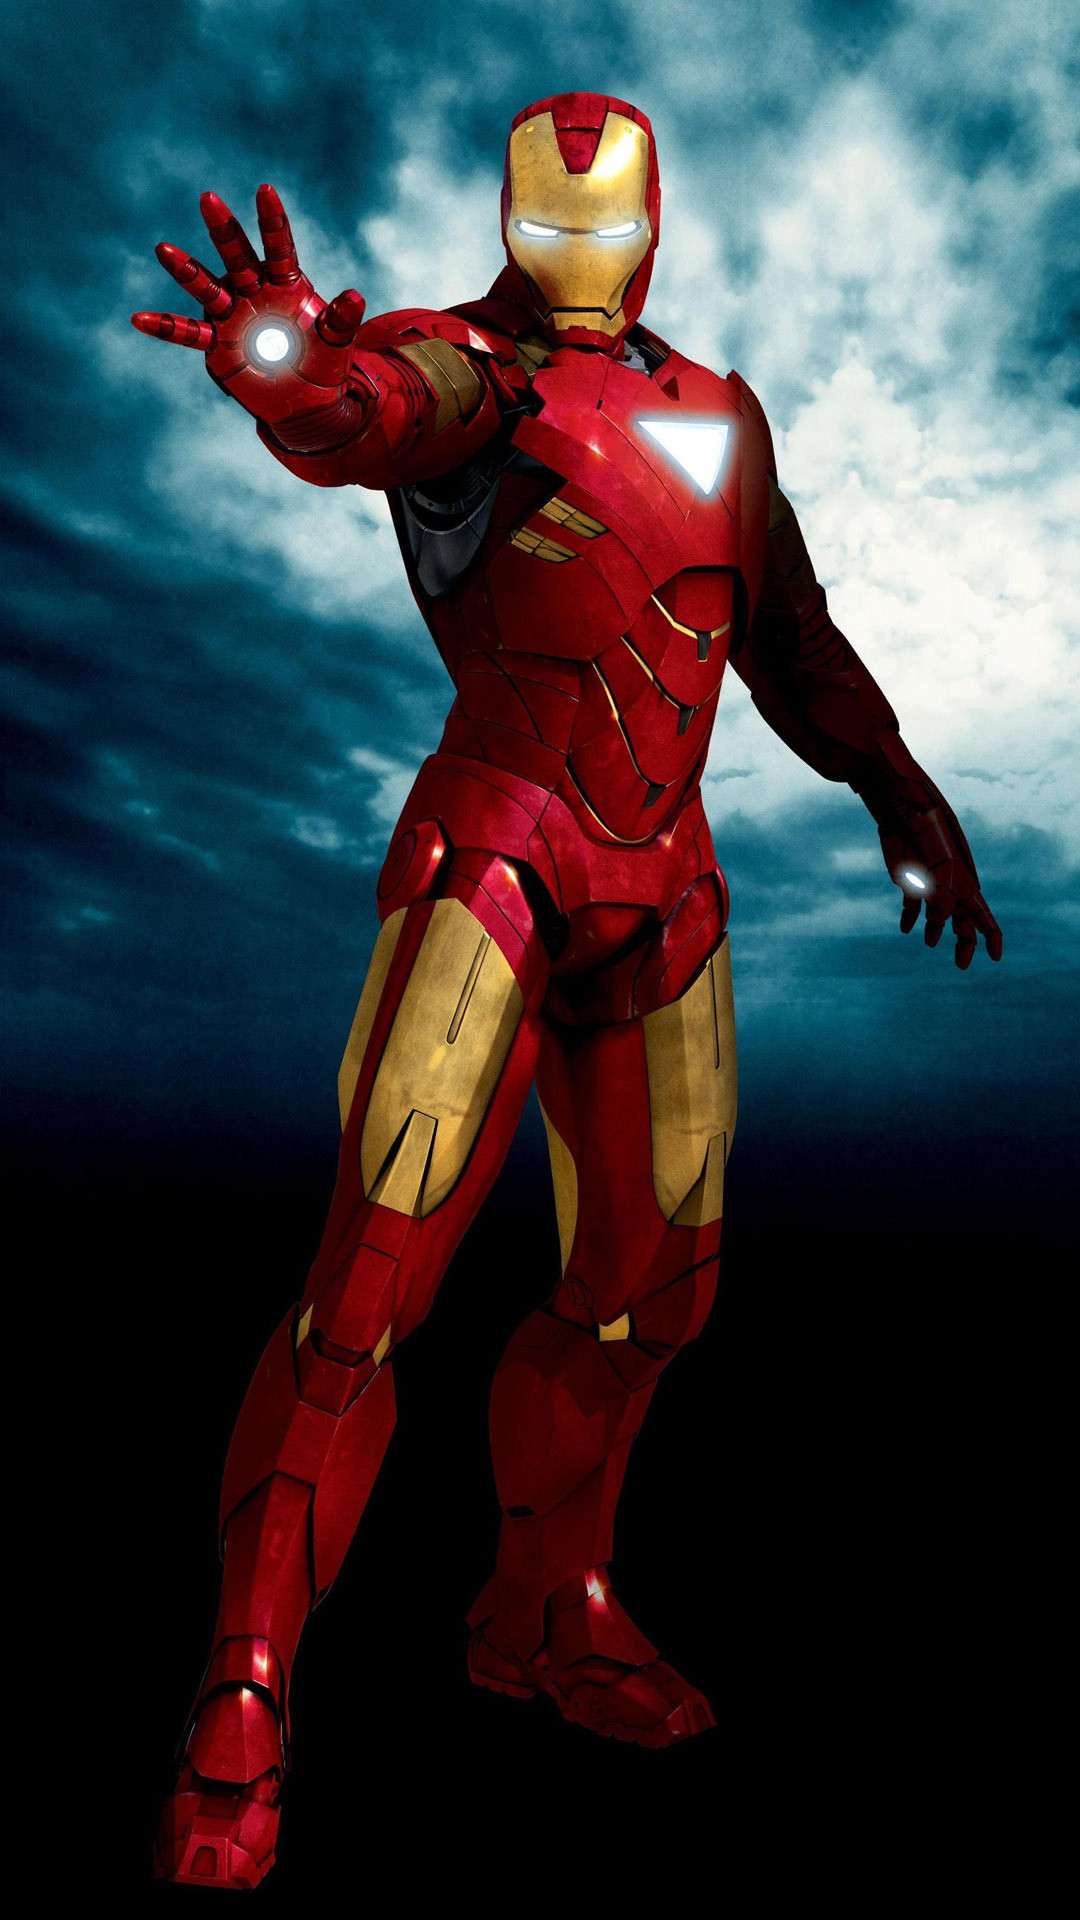 Robert Downey Jr Iron Man Wallpaper (71+ images)